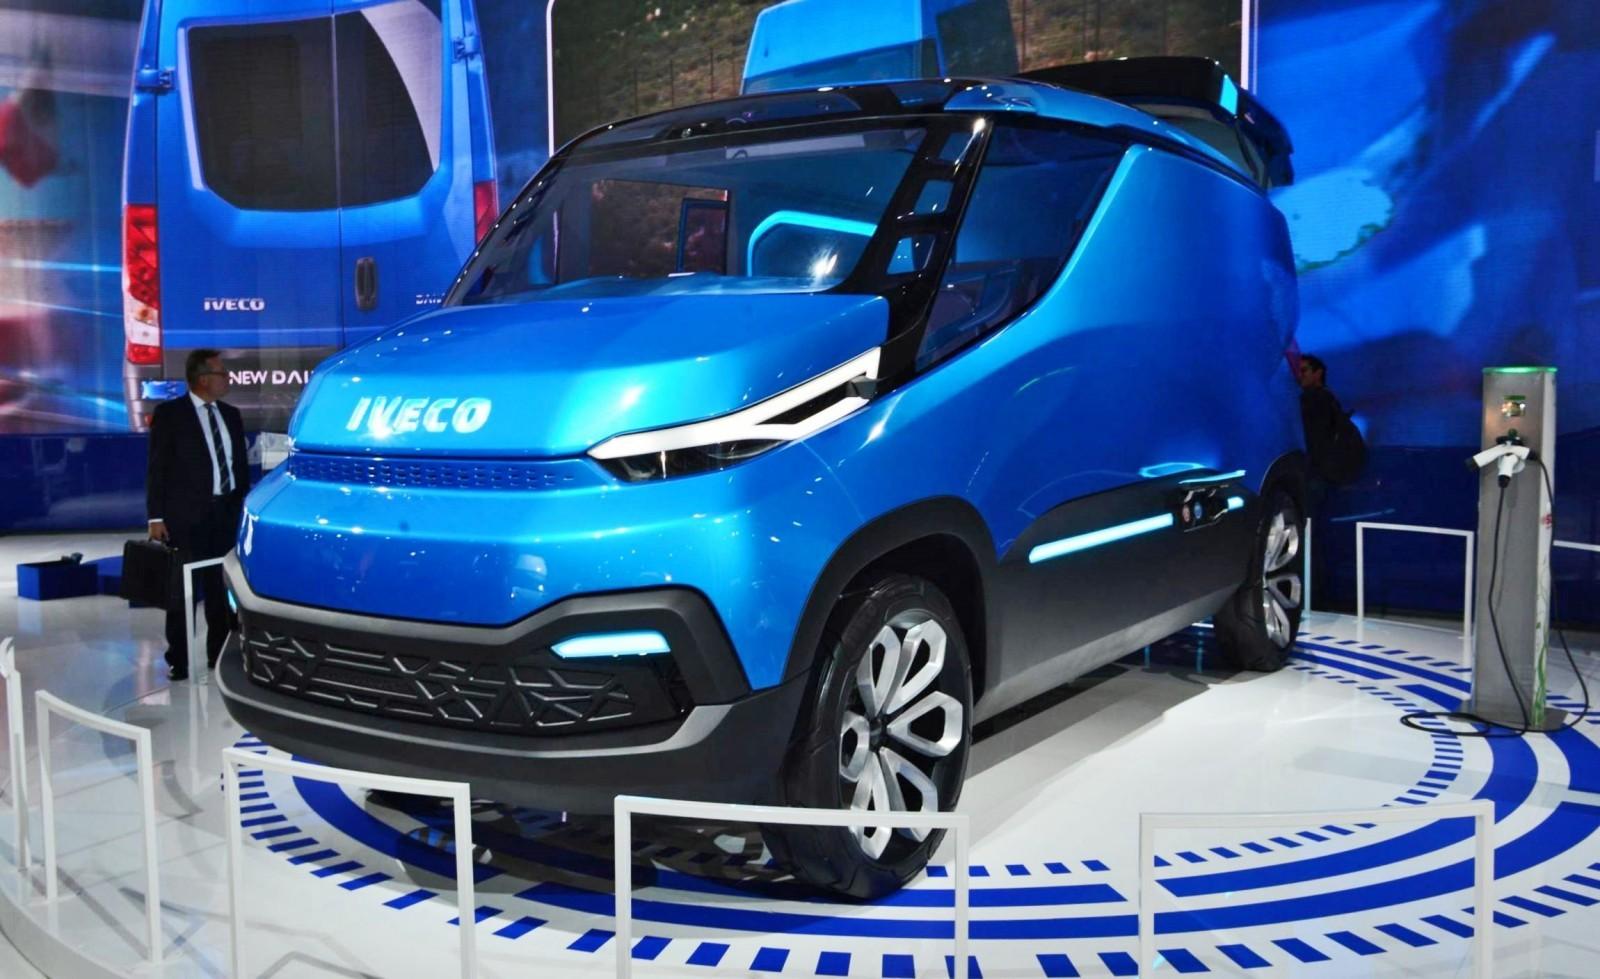 2015 IVECO Vision Concept Van 24